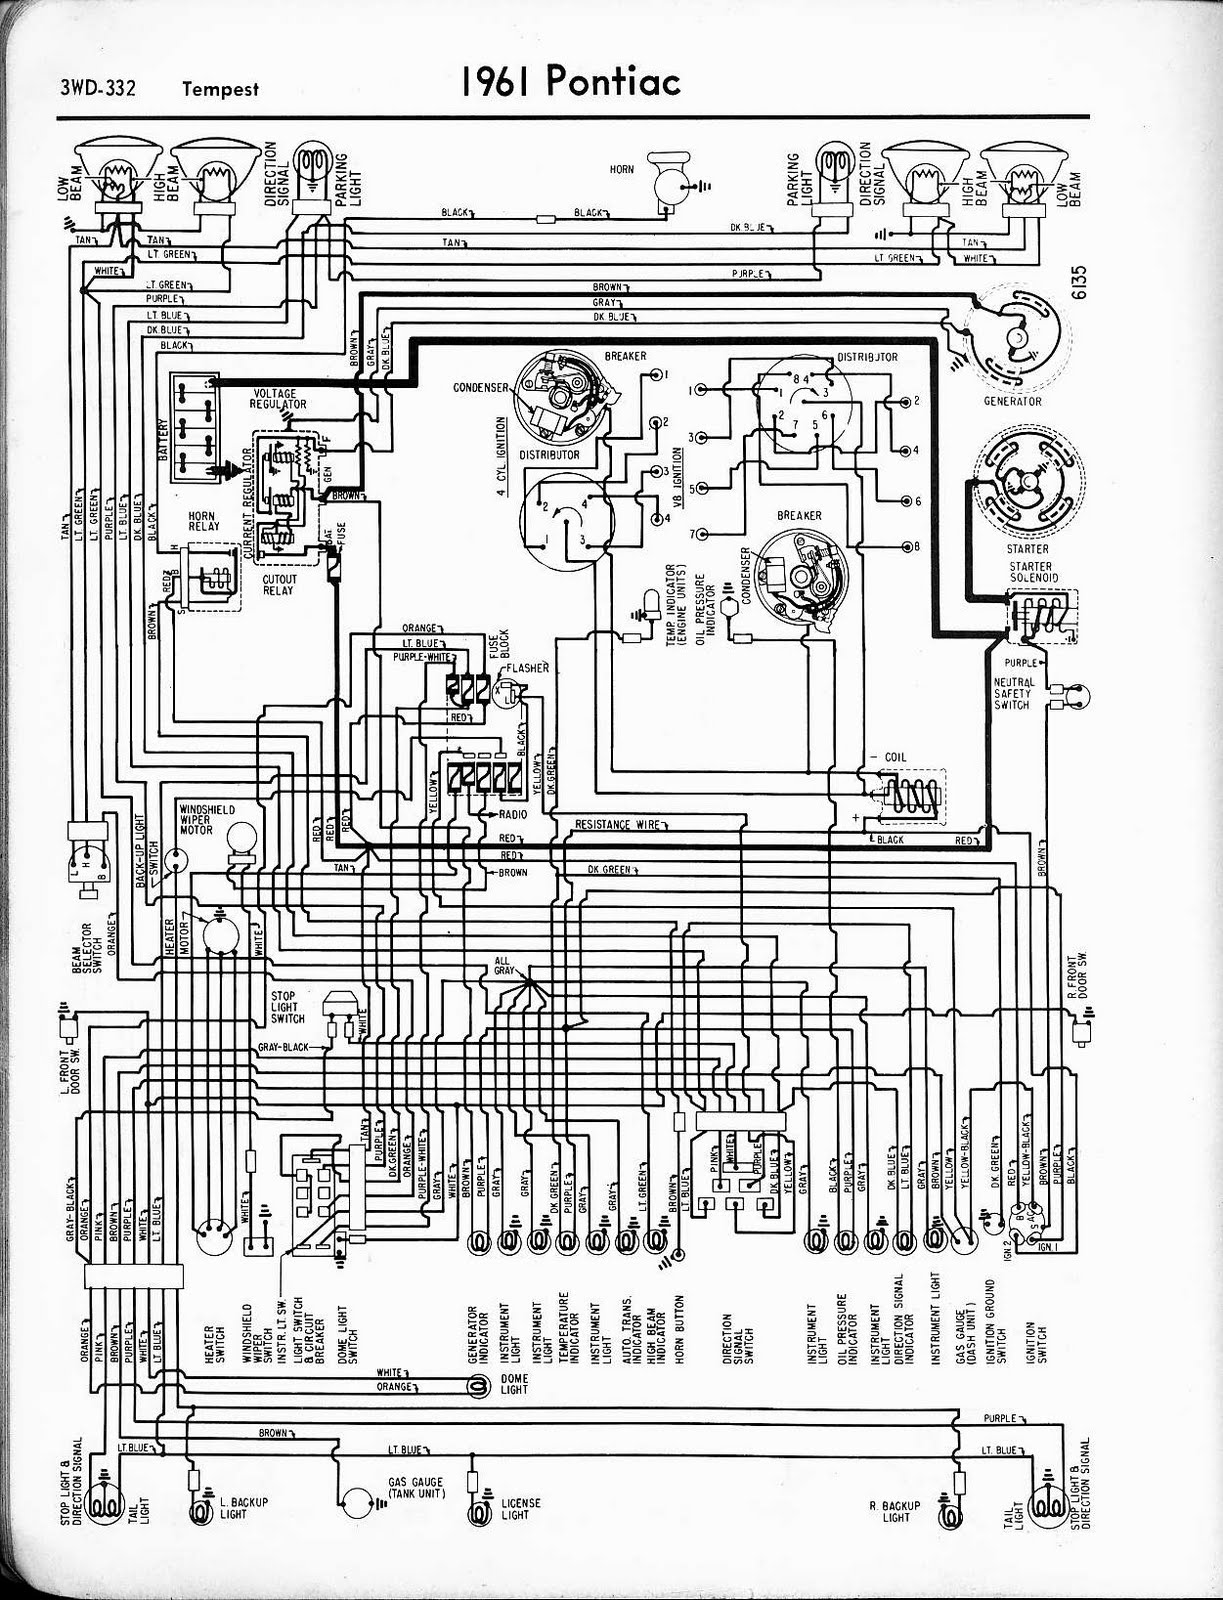 hight resolution of free auto wiring diagram 1961 pontiac tempest wiring diagram 2003 silverado fog light wiring harness 2009